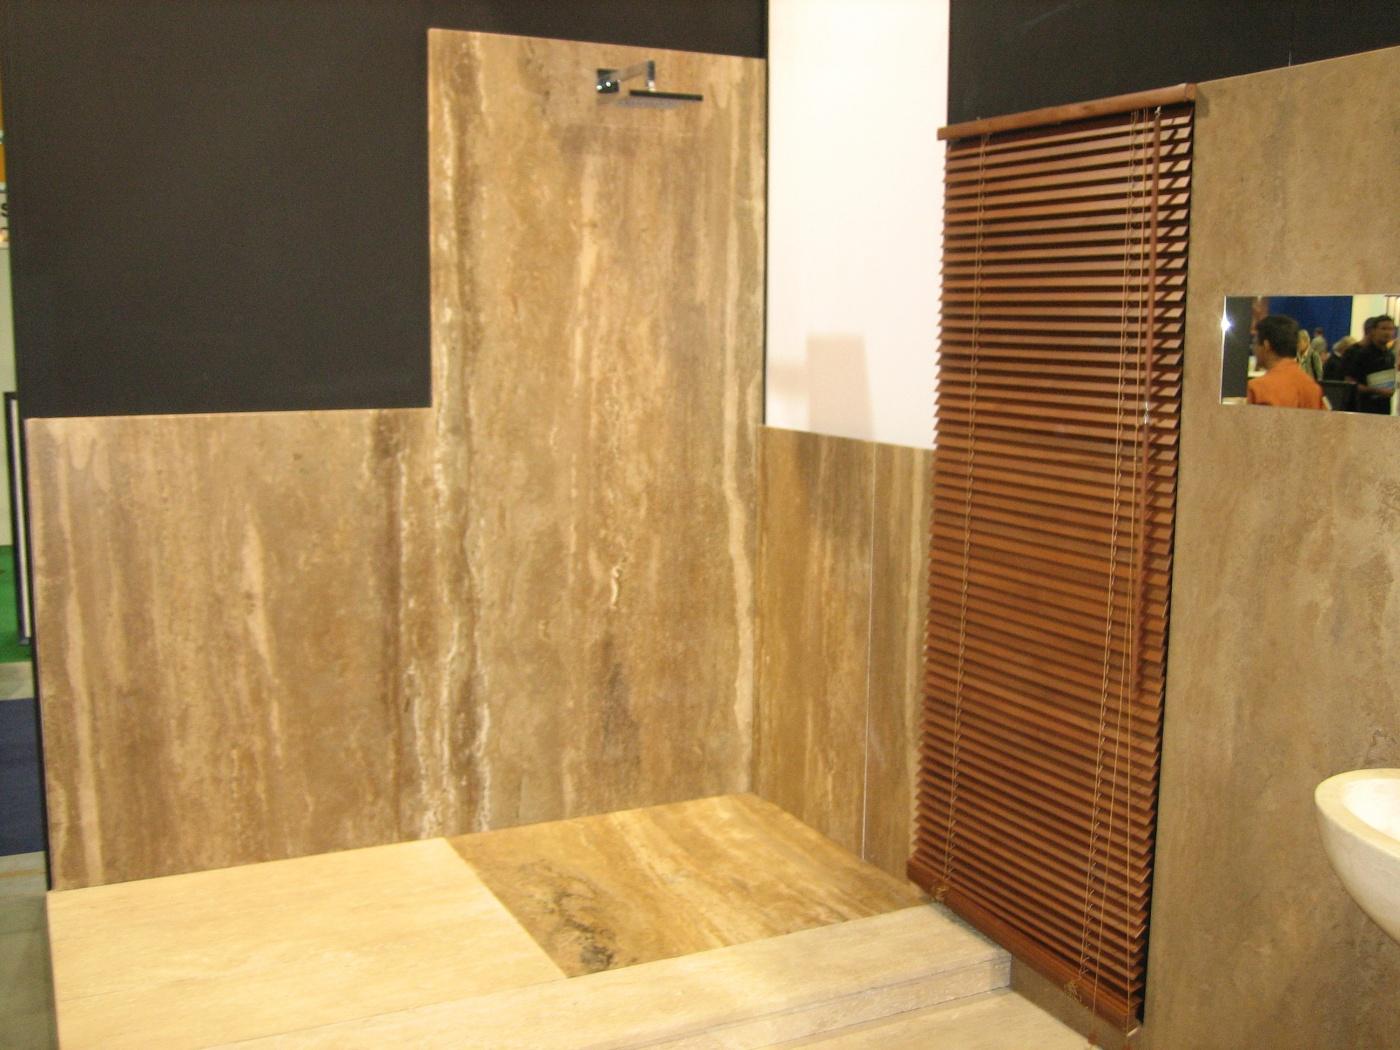 Salle de bains en Travertin Noce Travertino Noce - Marbrerie ...